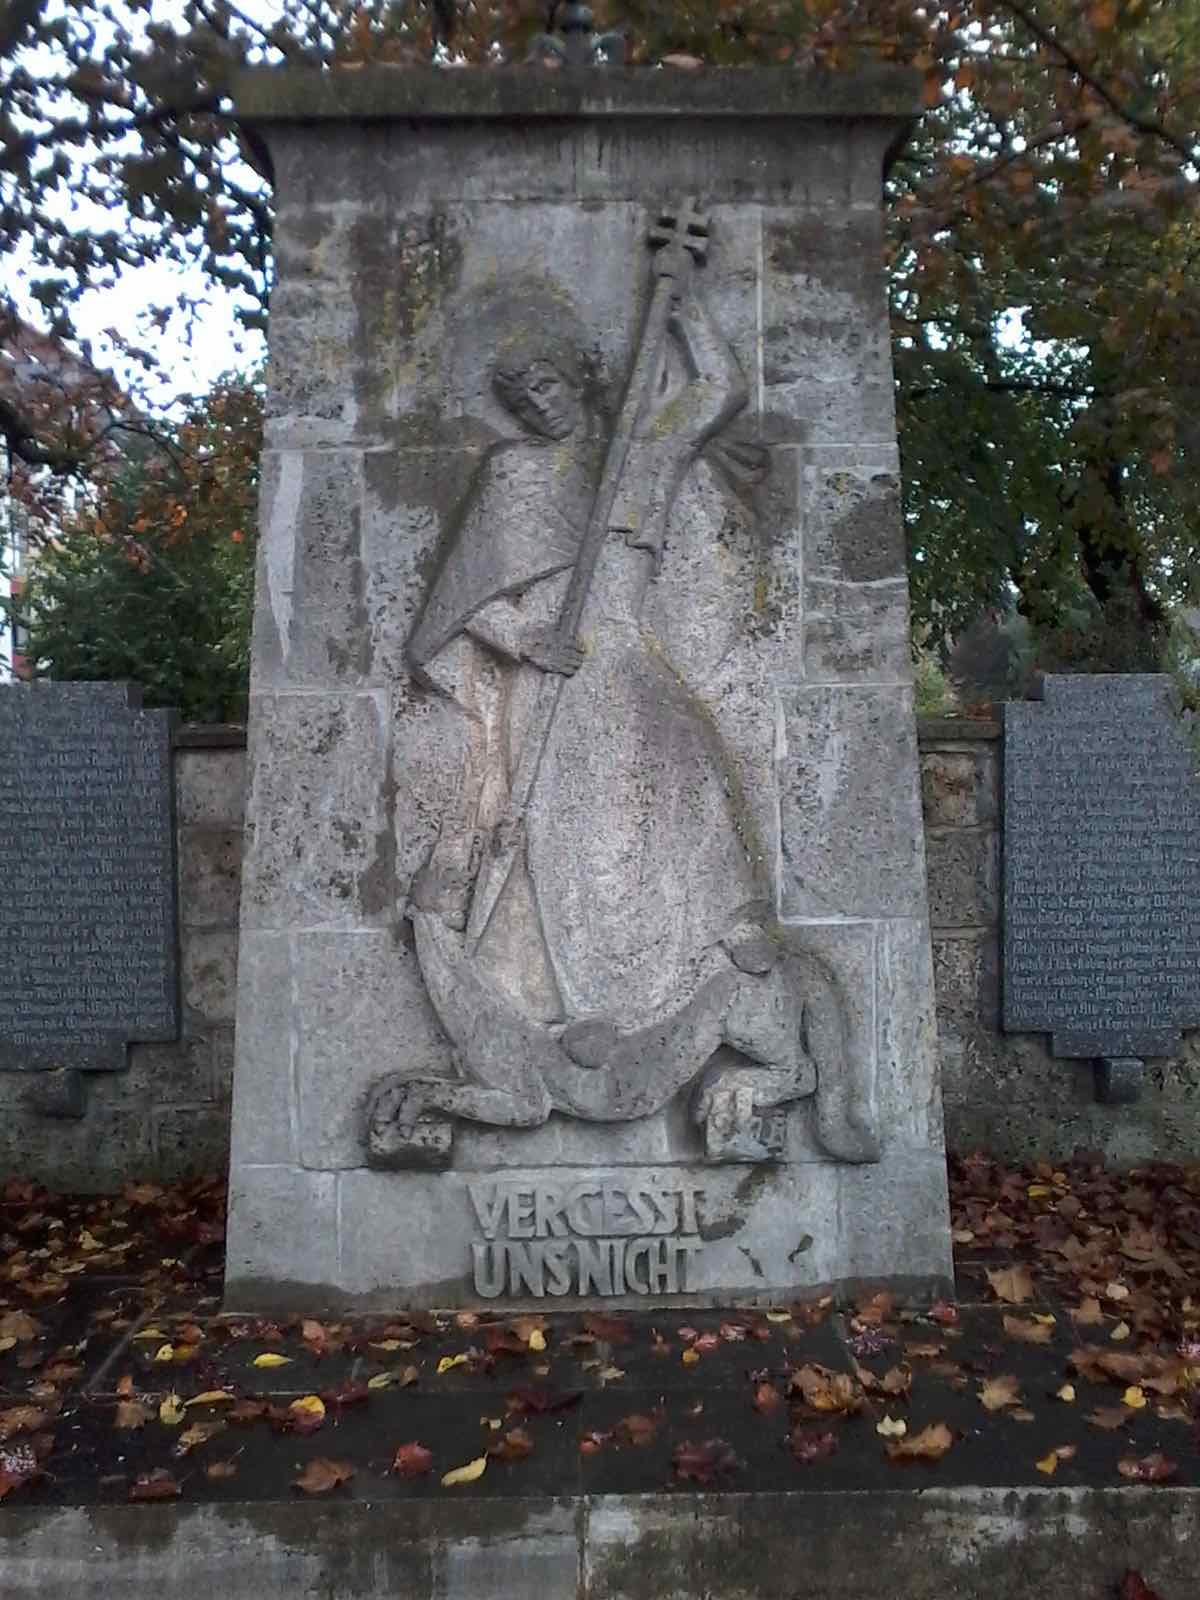 Engel ohne Flügel: Heldengedenken in Königsbrunn (c) DAZ